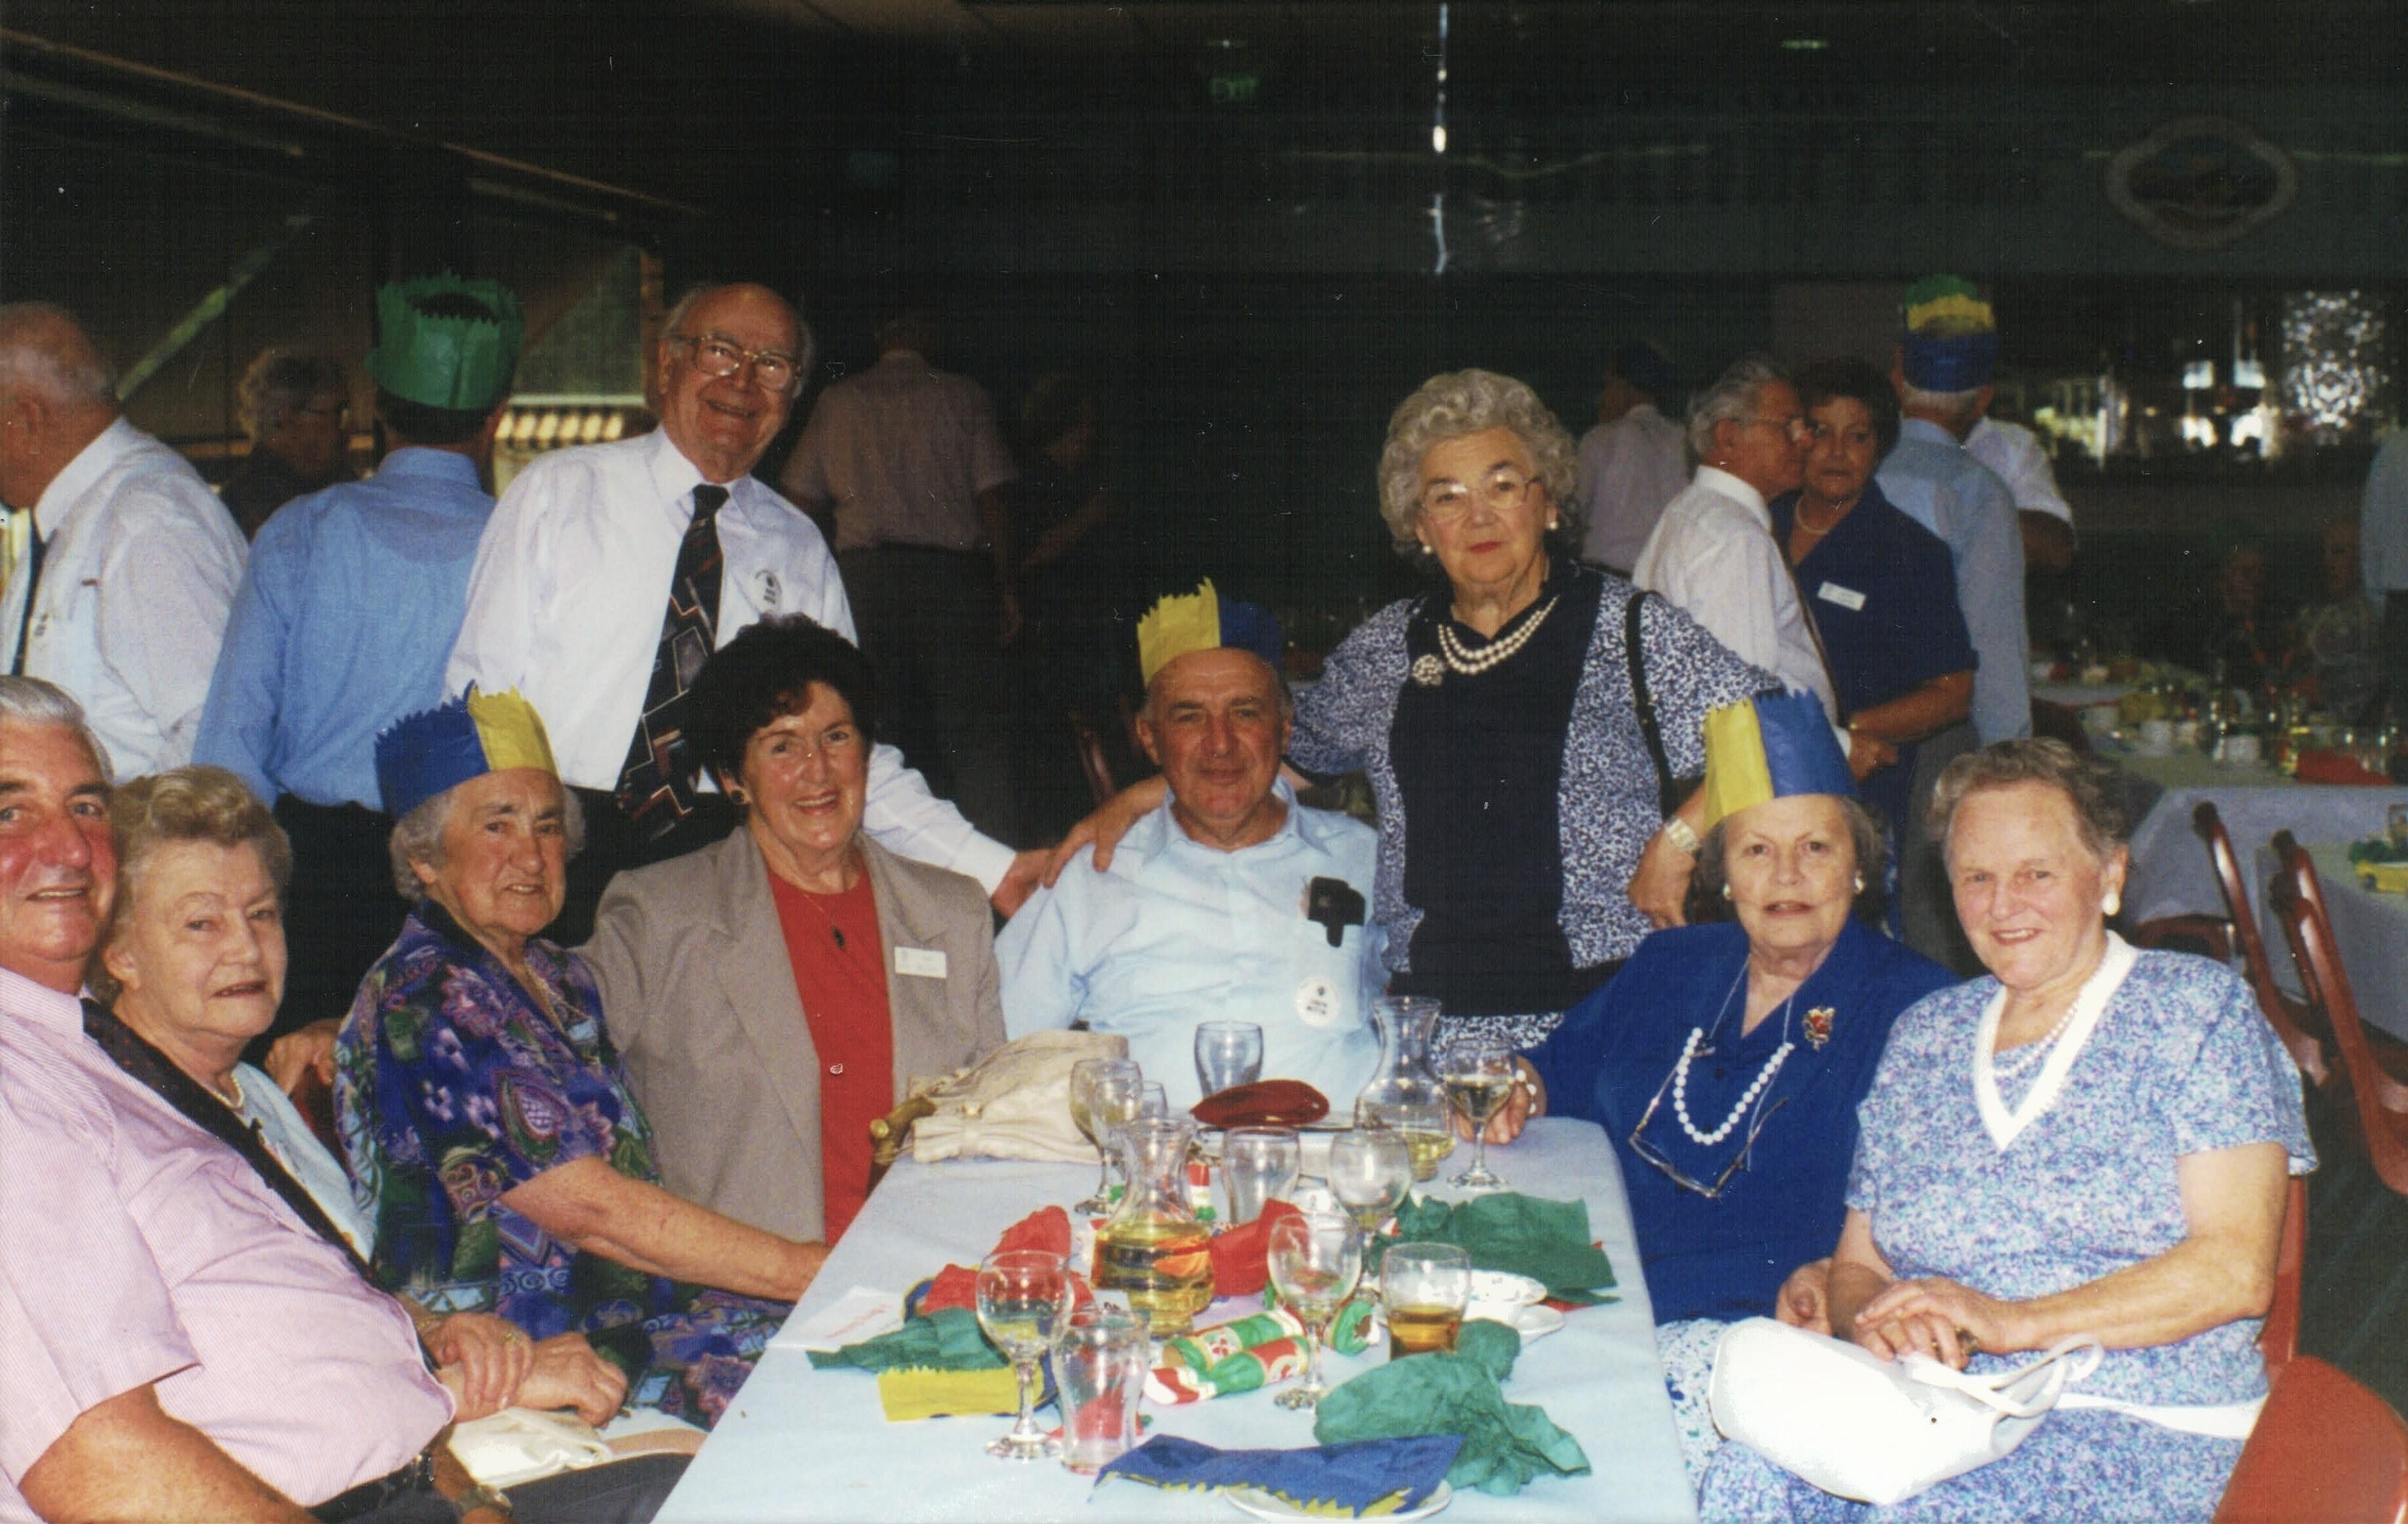 1997 Activities Christmas Luncheon at Av